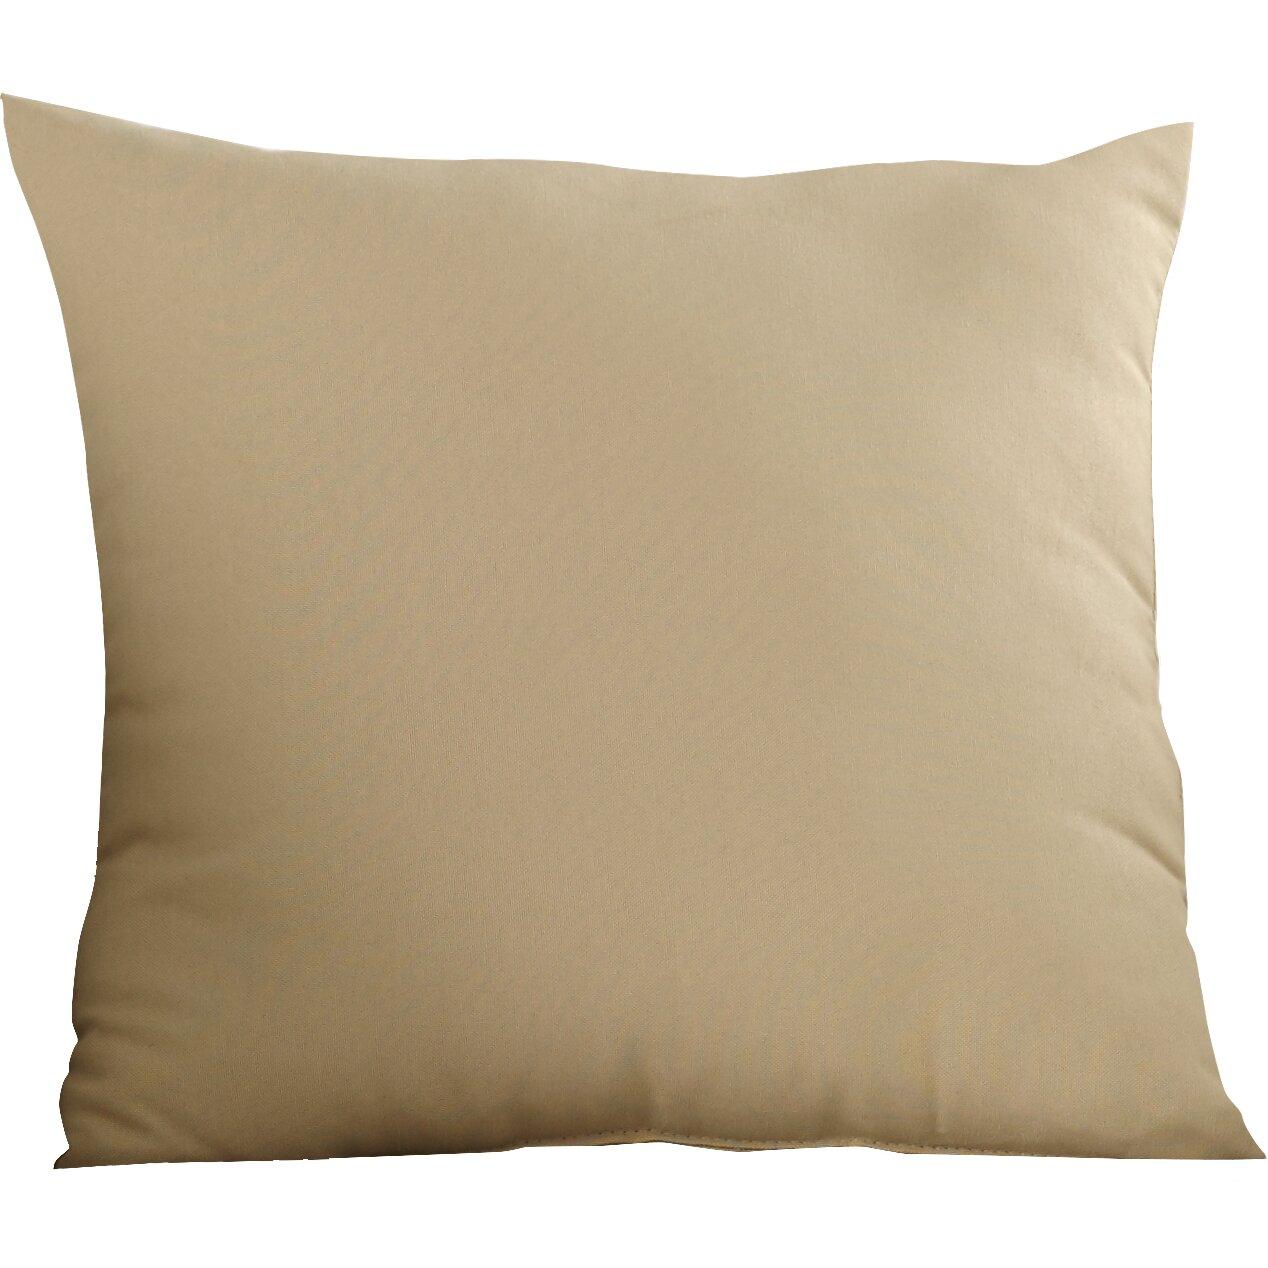 Throw Pillows For Patio Furniture